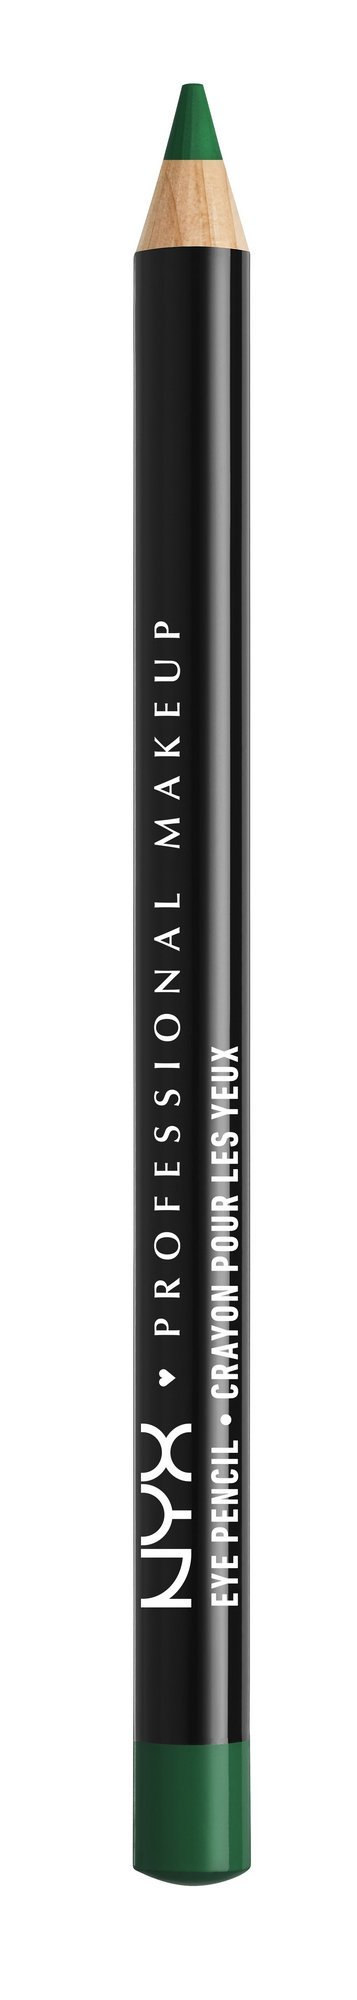 Nyx Cosmetics Slim Eye Pencil, Emerald City